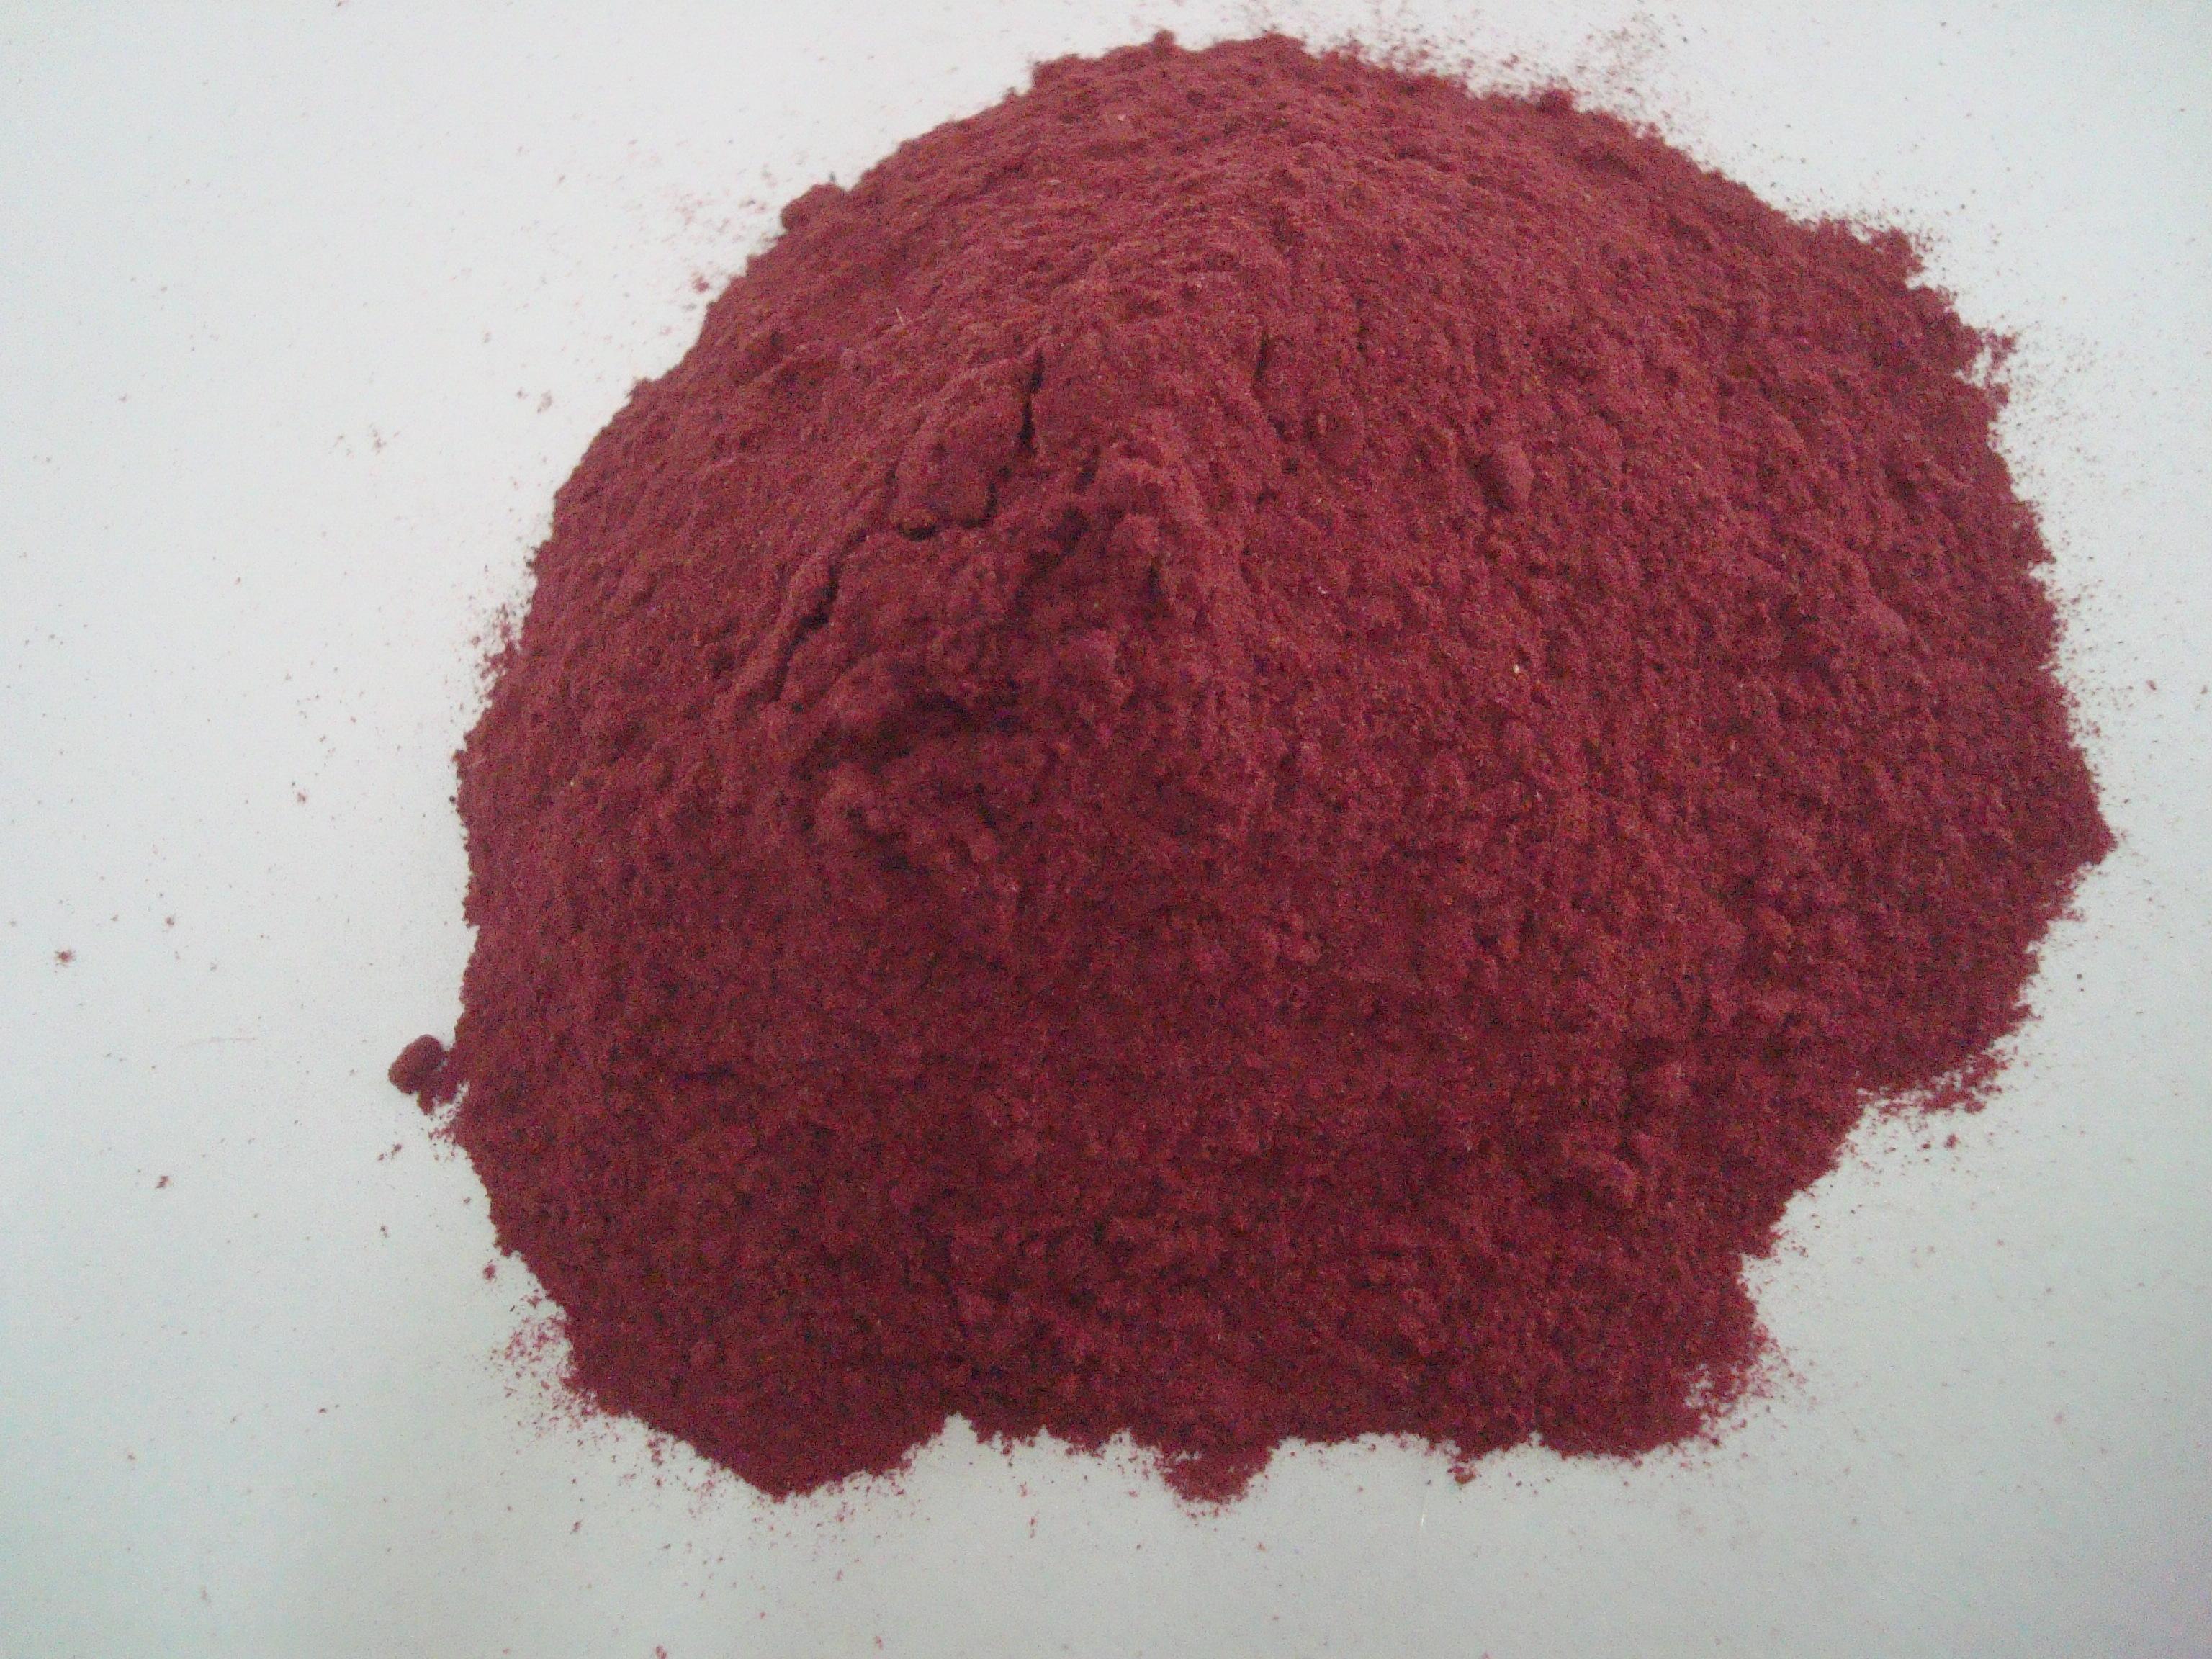 Hibiscus Flakes & Powder